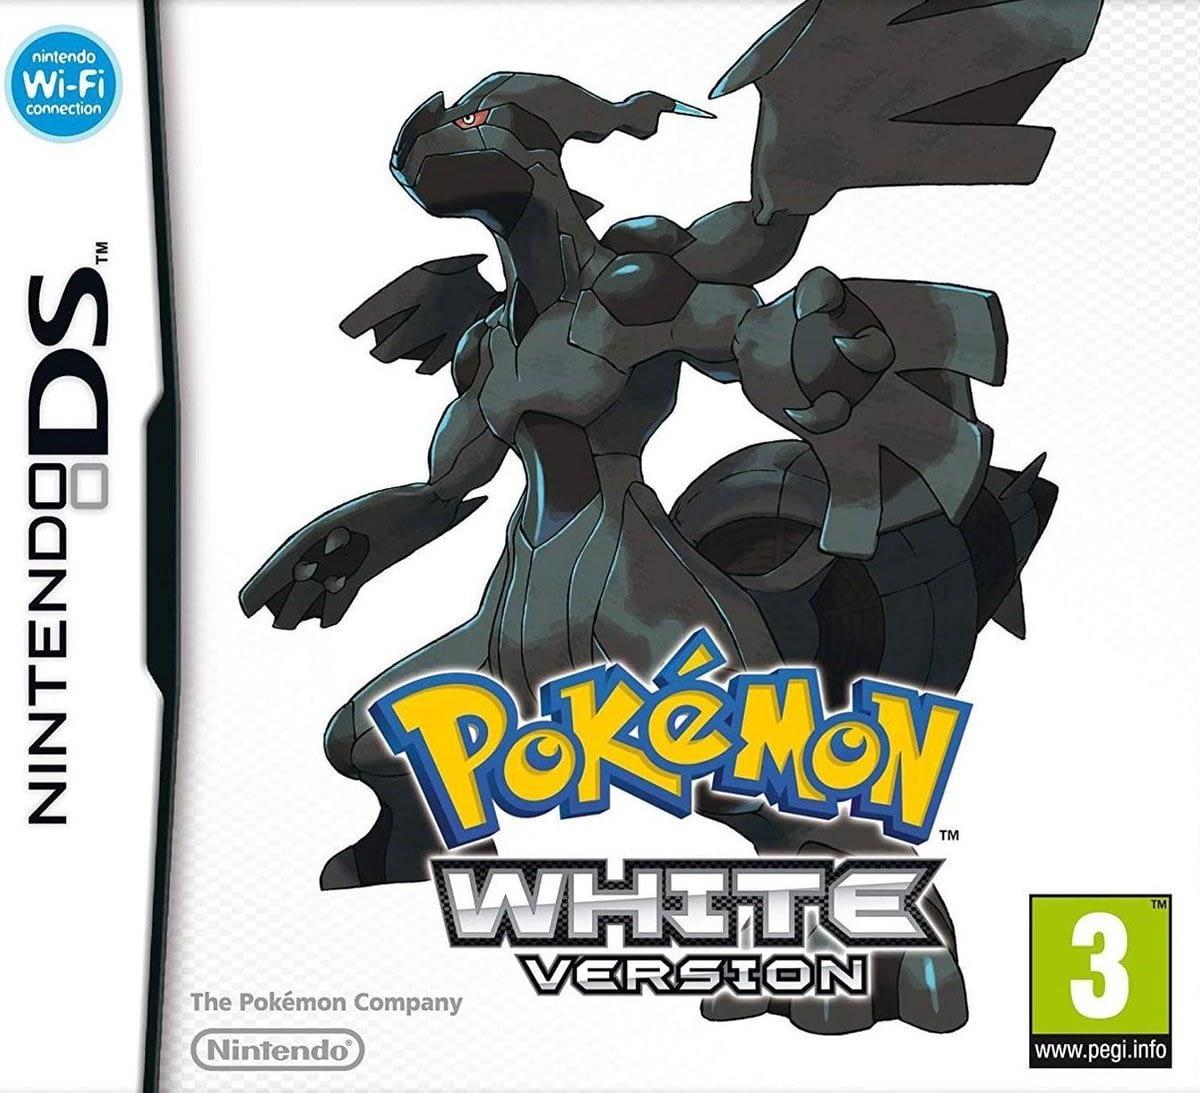 Pokemon White een geheel nieuwe pokemon wereld